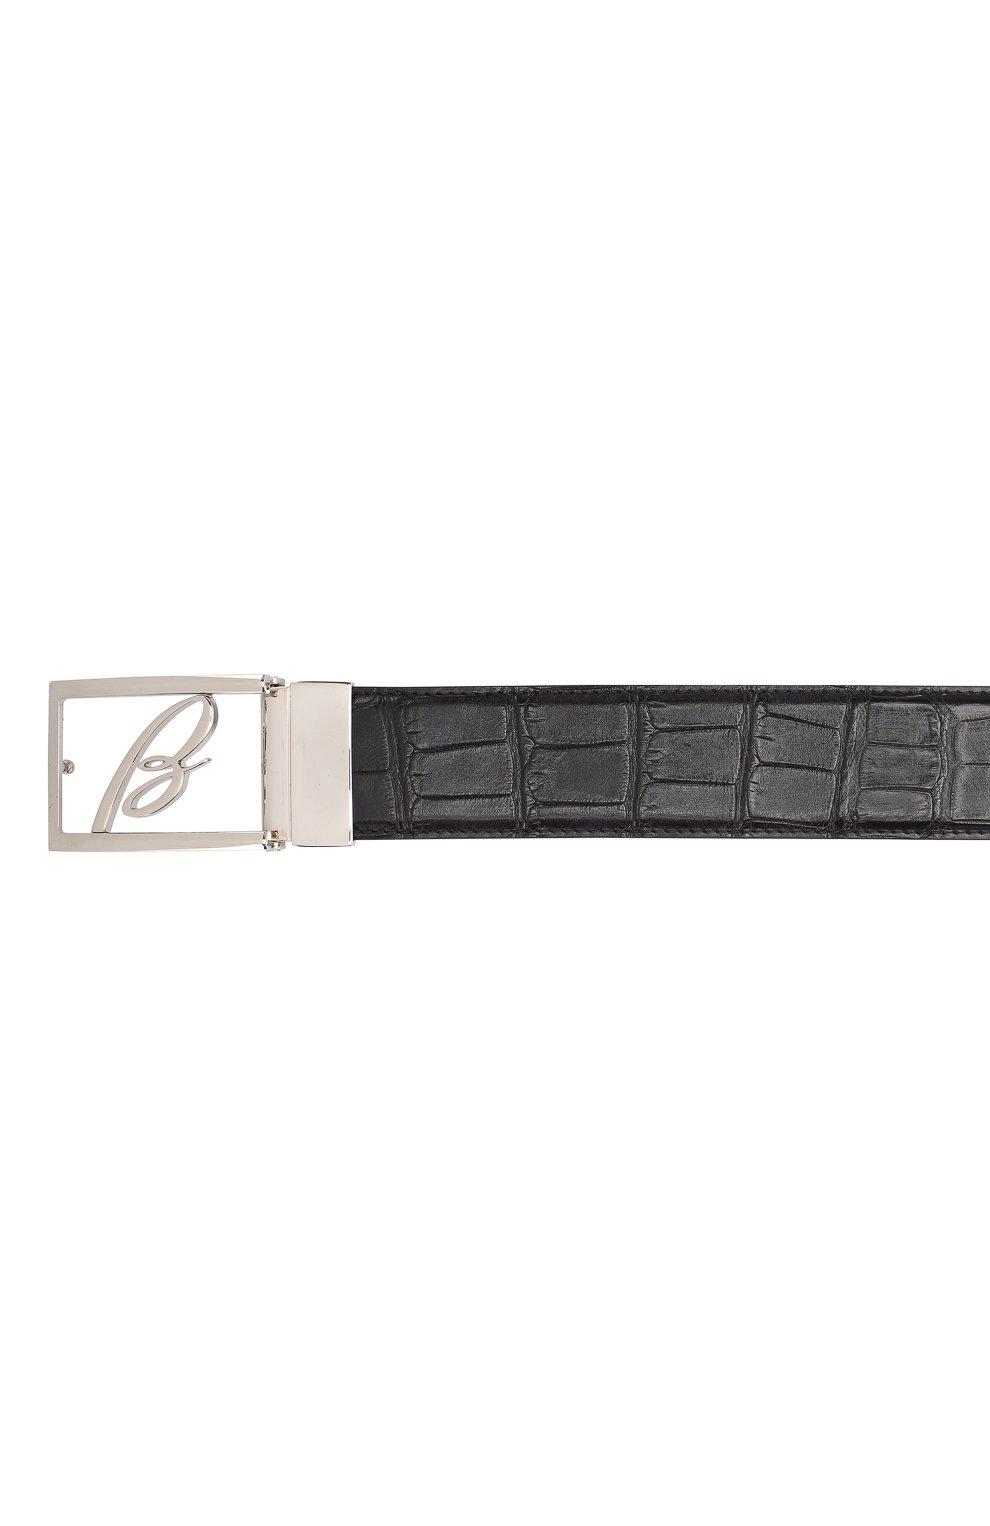 Мужской ремень из кожи аллигатора BRIONI черного цвета, арт. 0BAG0L/P8722/AMIS | Фото 3